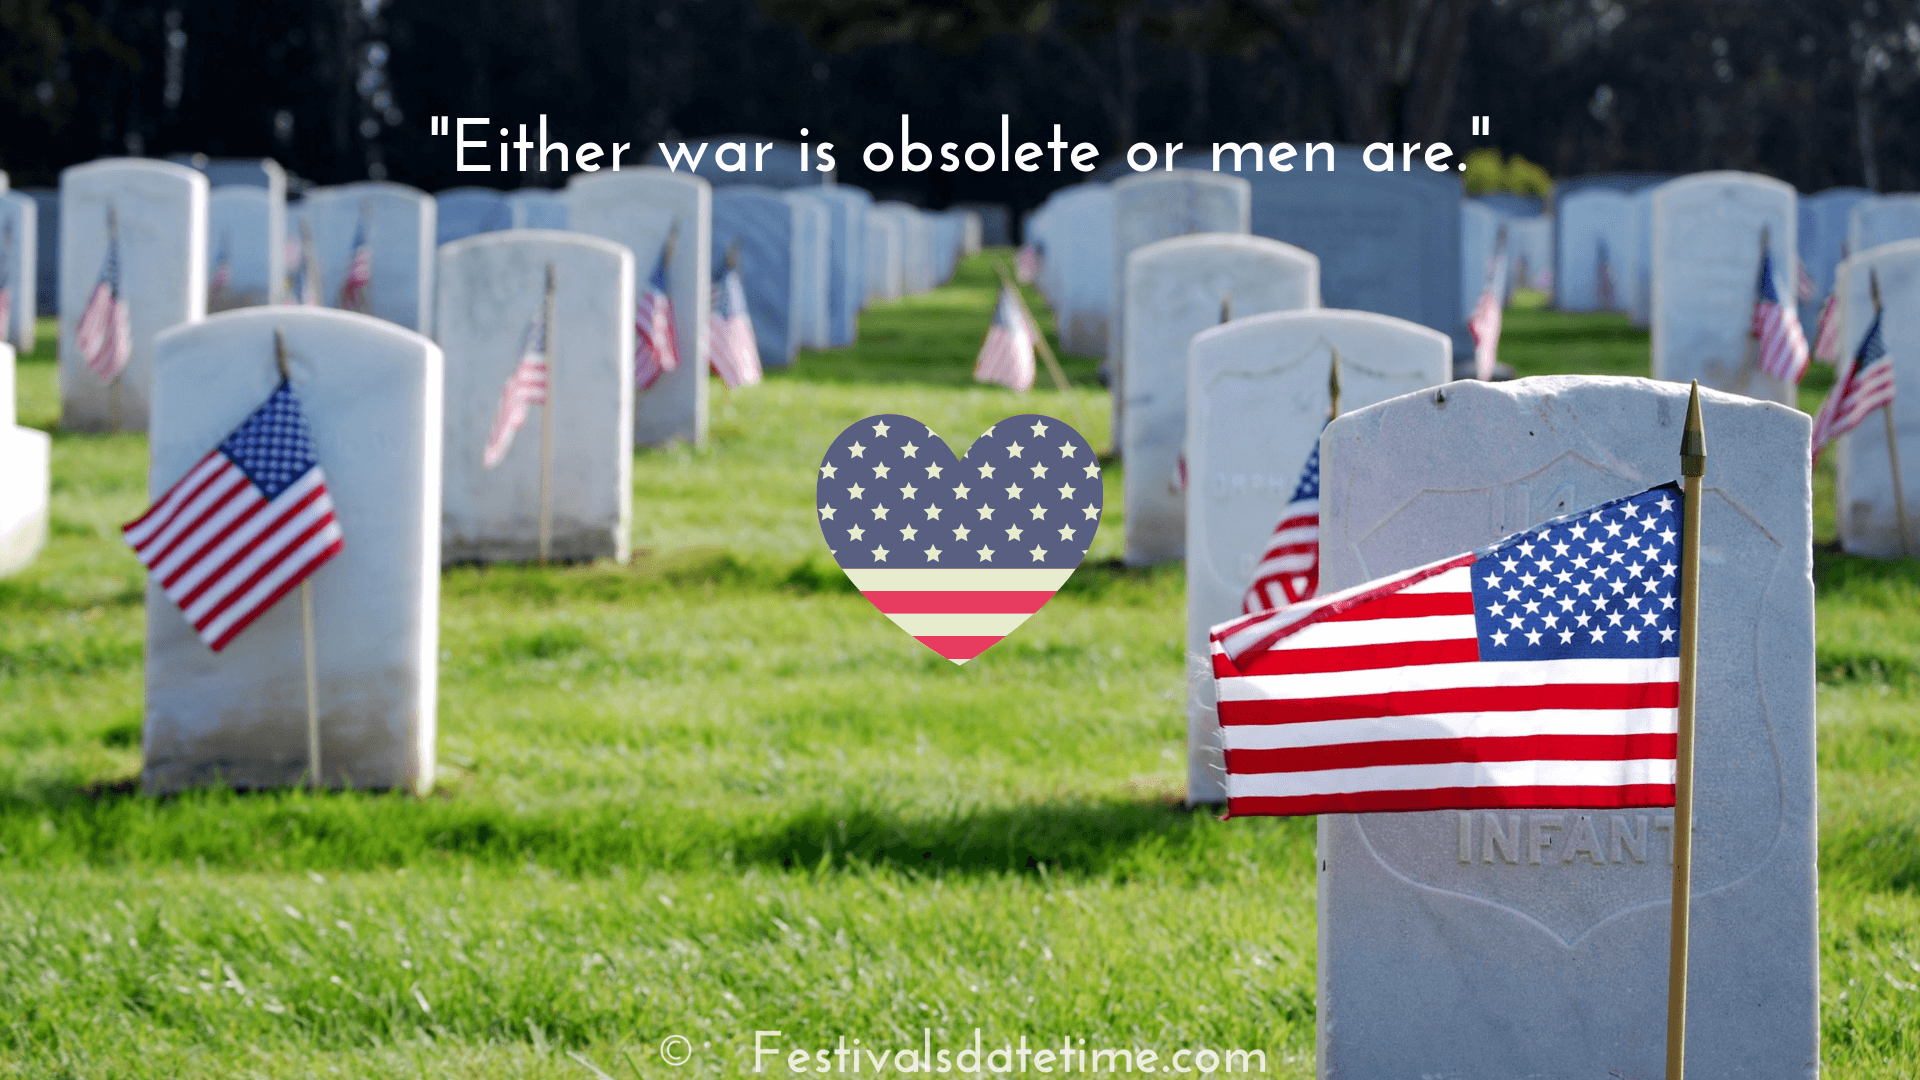 veterans day celebration images